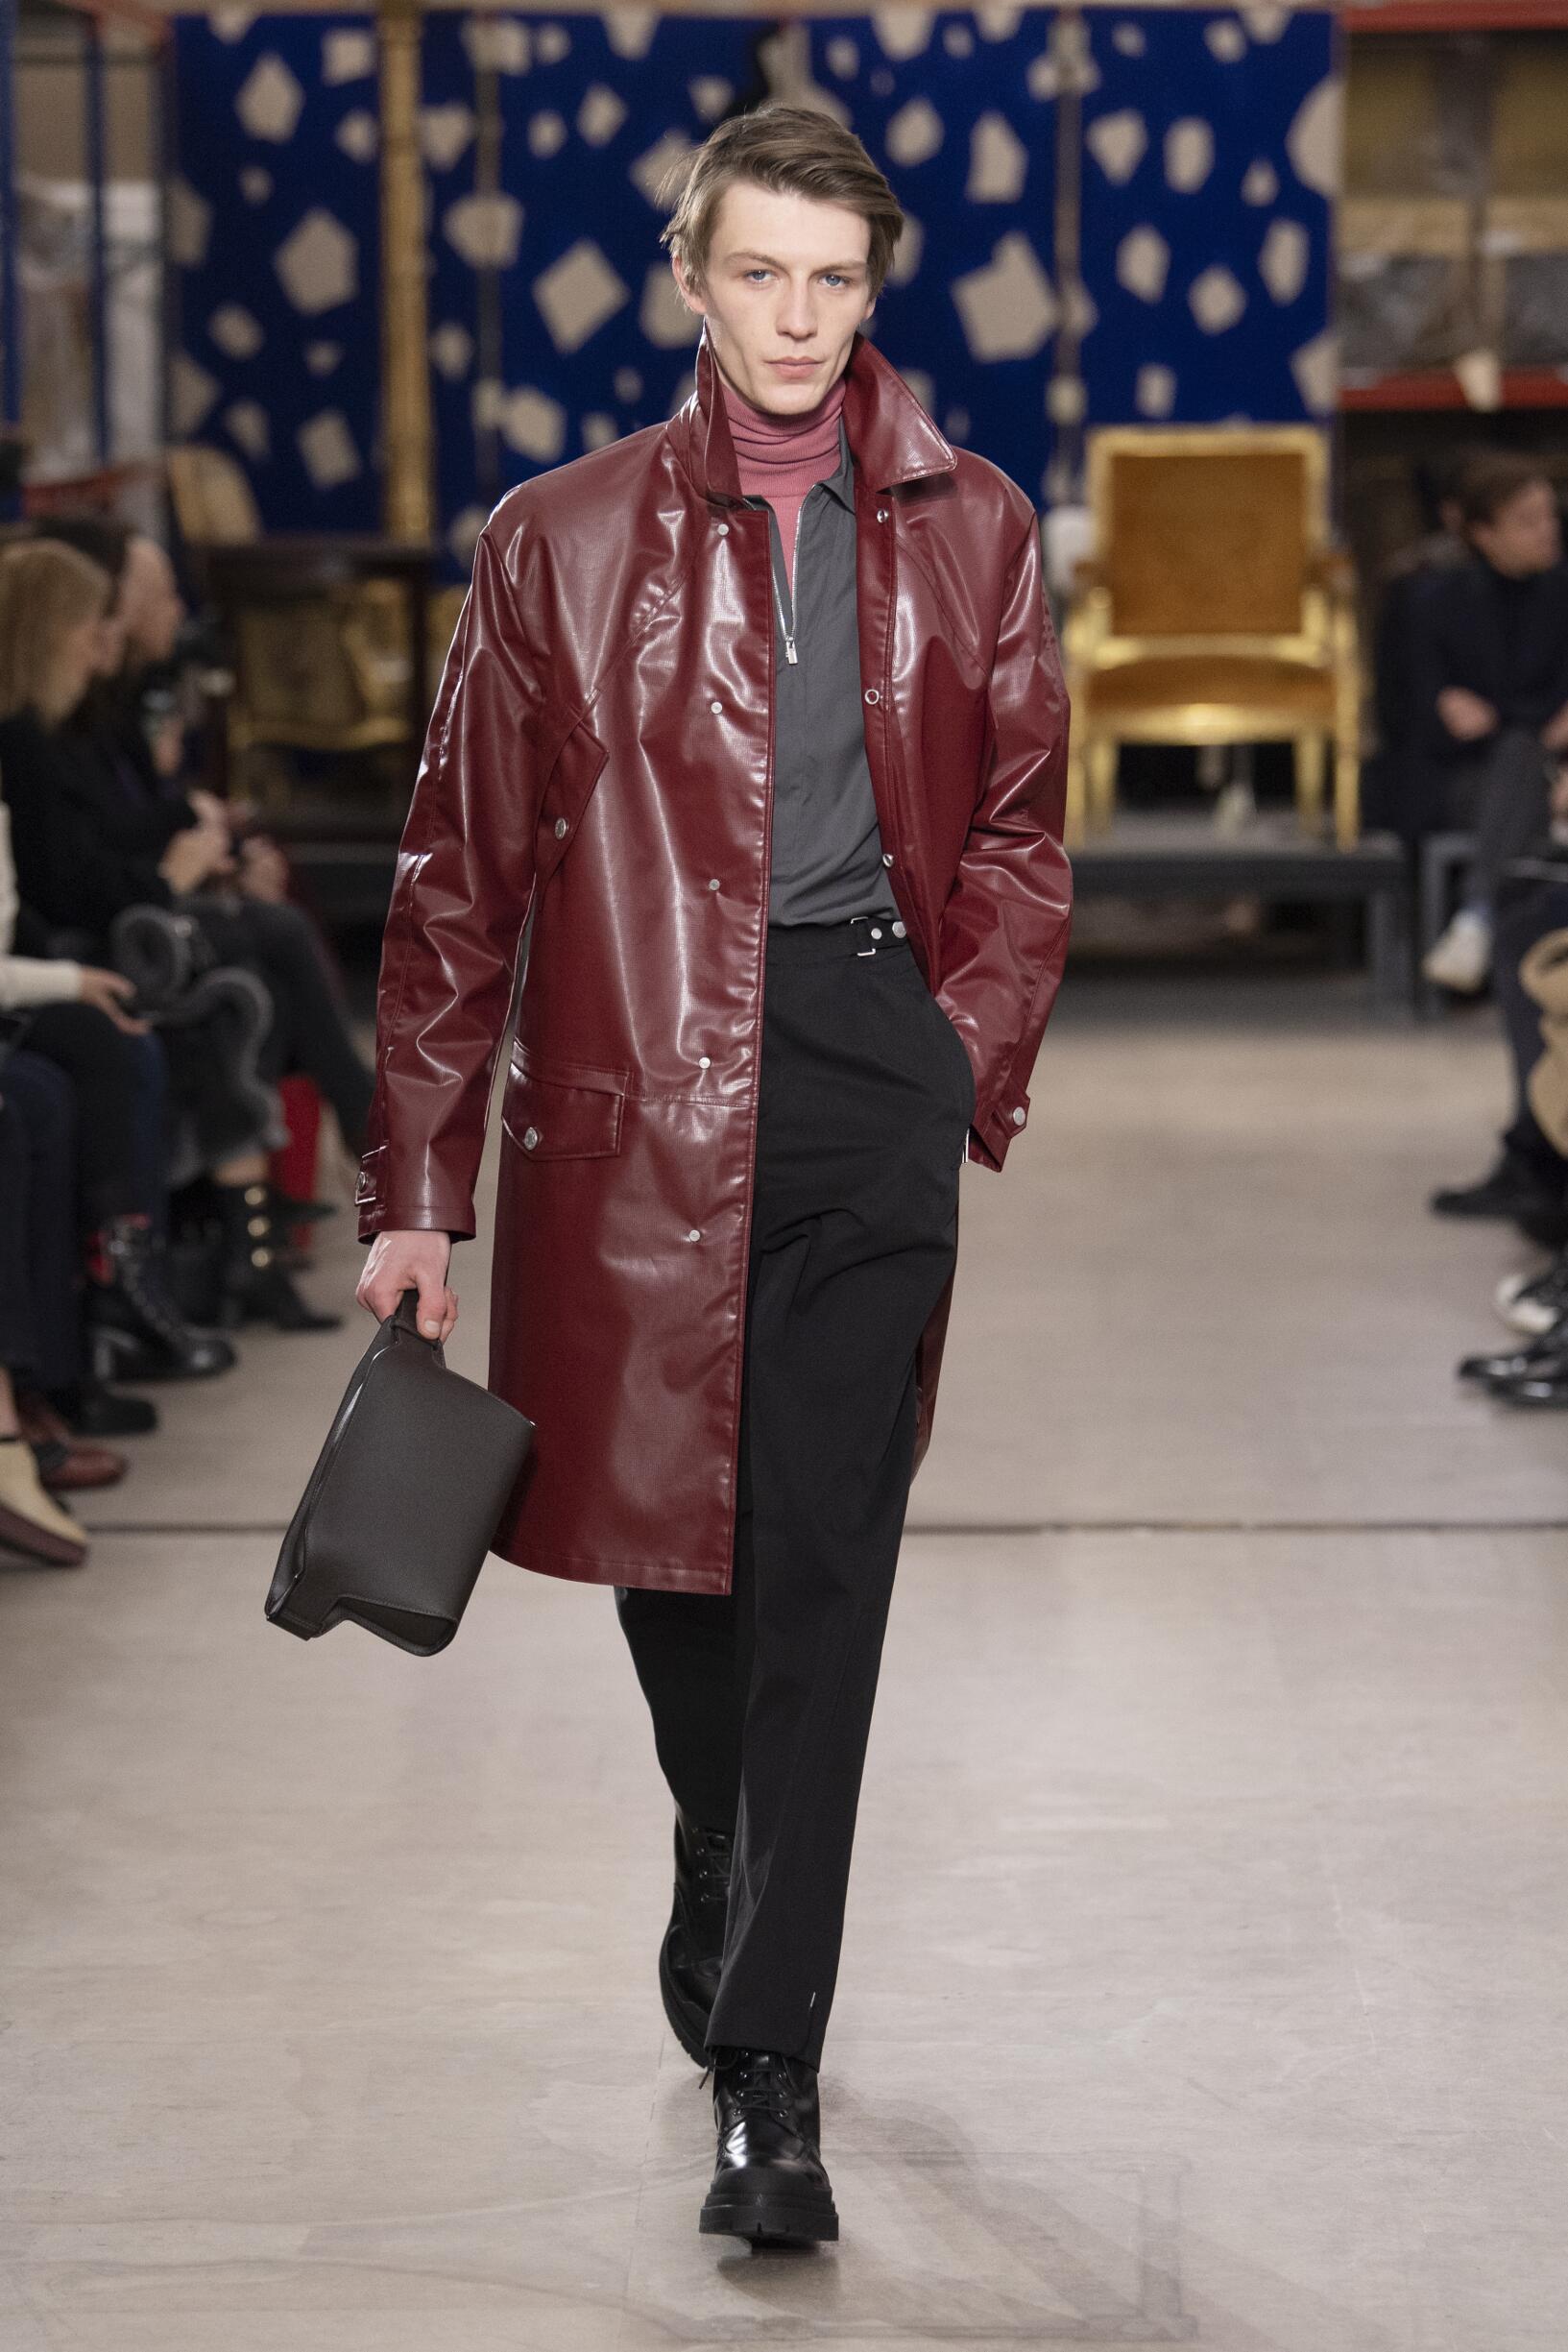 Fashion Show Man Model Hermès Catwalk